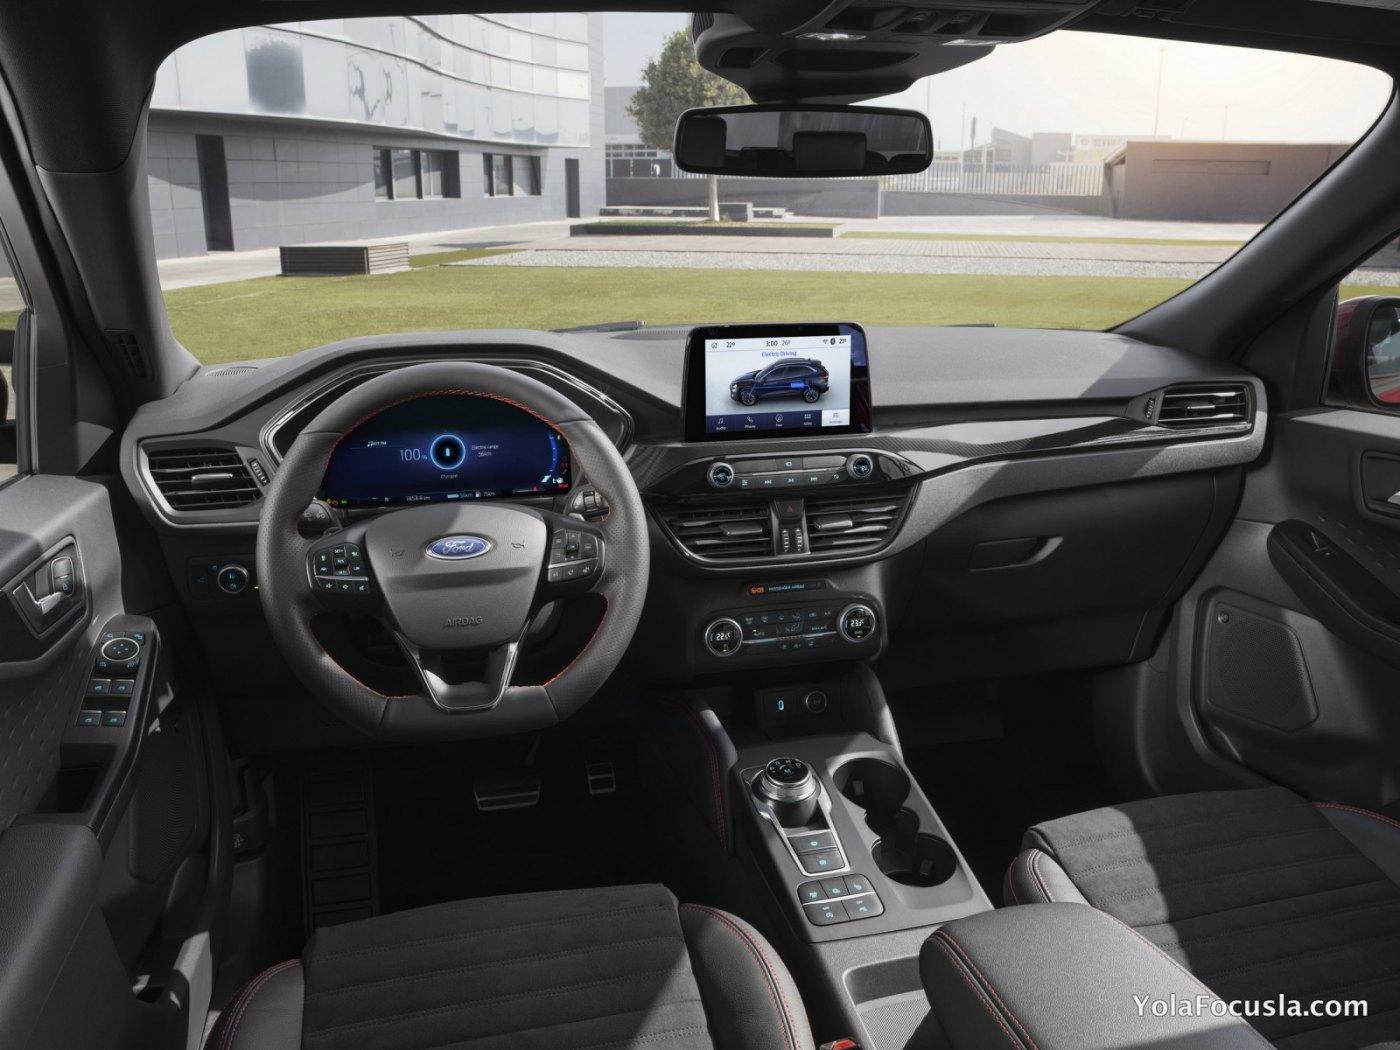 2019 Ford Kuga_7.jpg